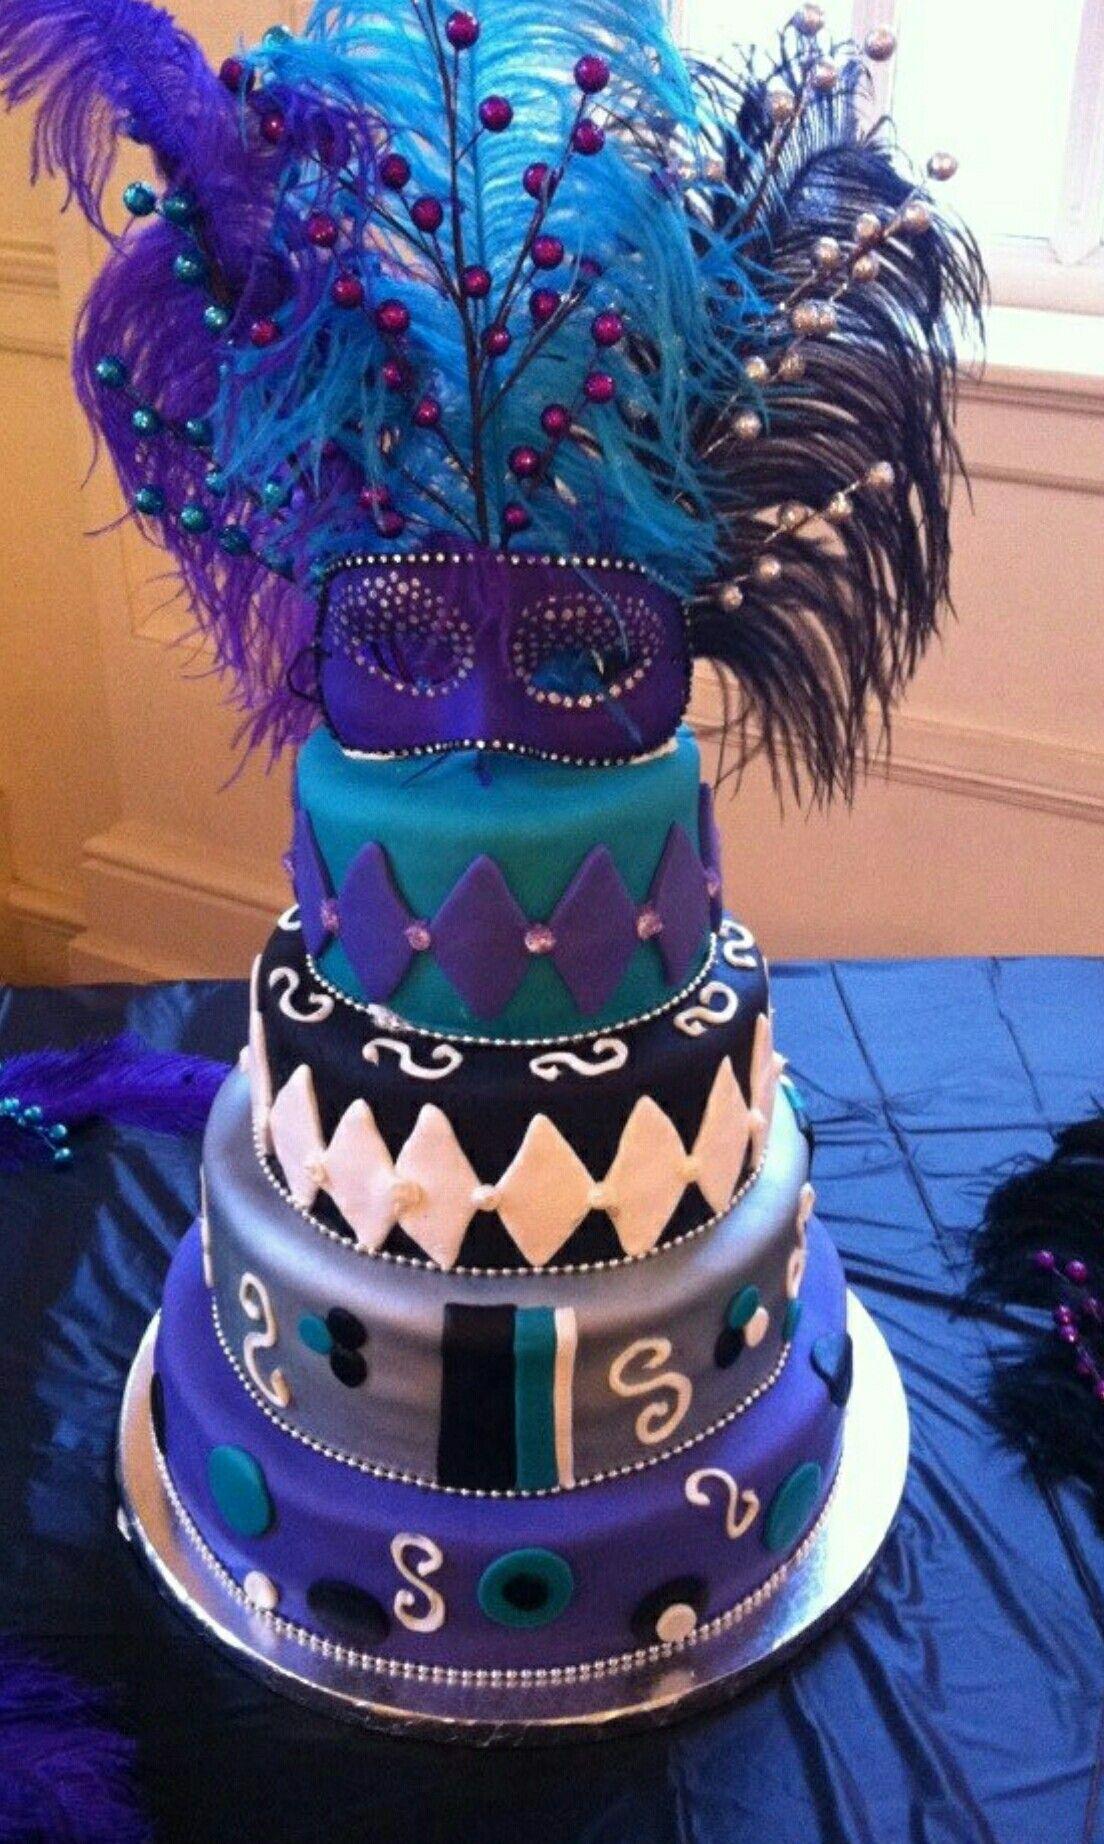 Mardi Gras Masquerade Birthday Cake Mardi Gras 60th Birthday Party